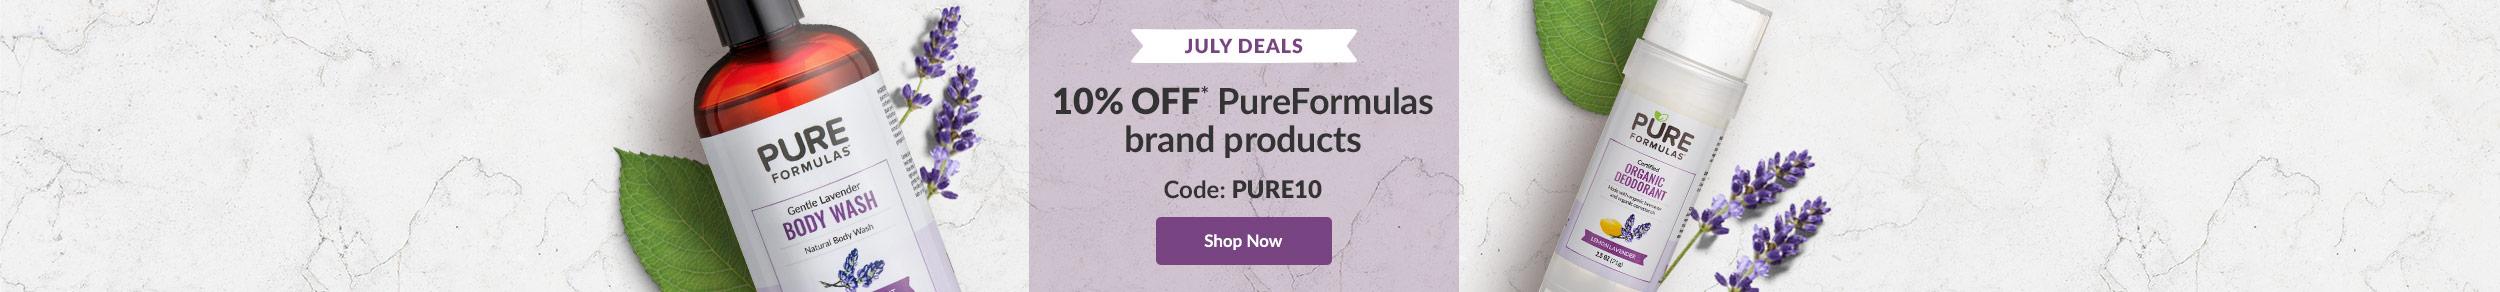 https://i3.pureformulas.net/images/static/PureFormulas_Beauty_Store_062819.jpg